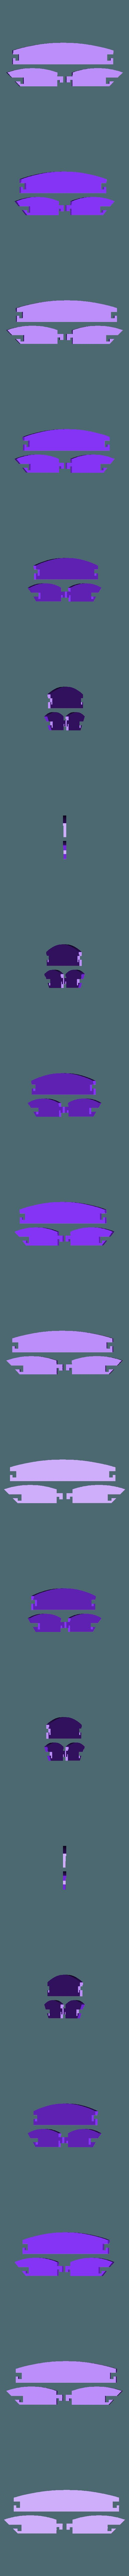 3_Left_Frame.stl Download free STL file The Infill Frame (220.3 x 318)mm • 3D printer design, Double_Alfa_3D